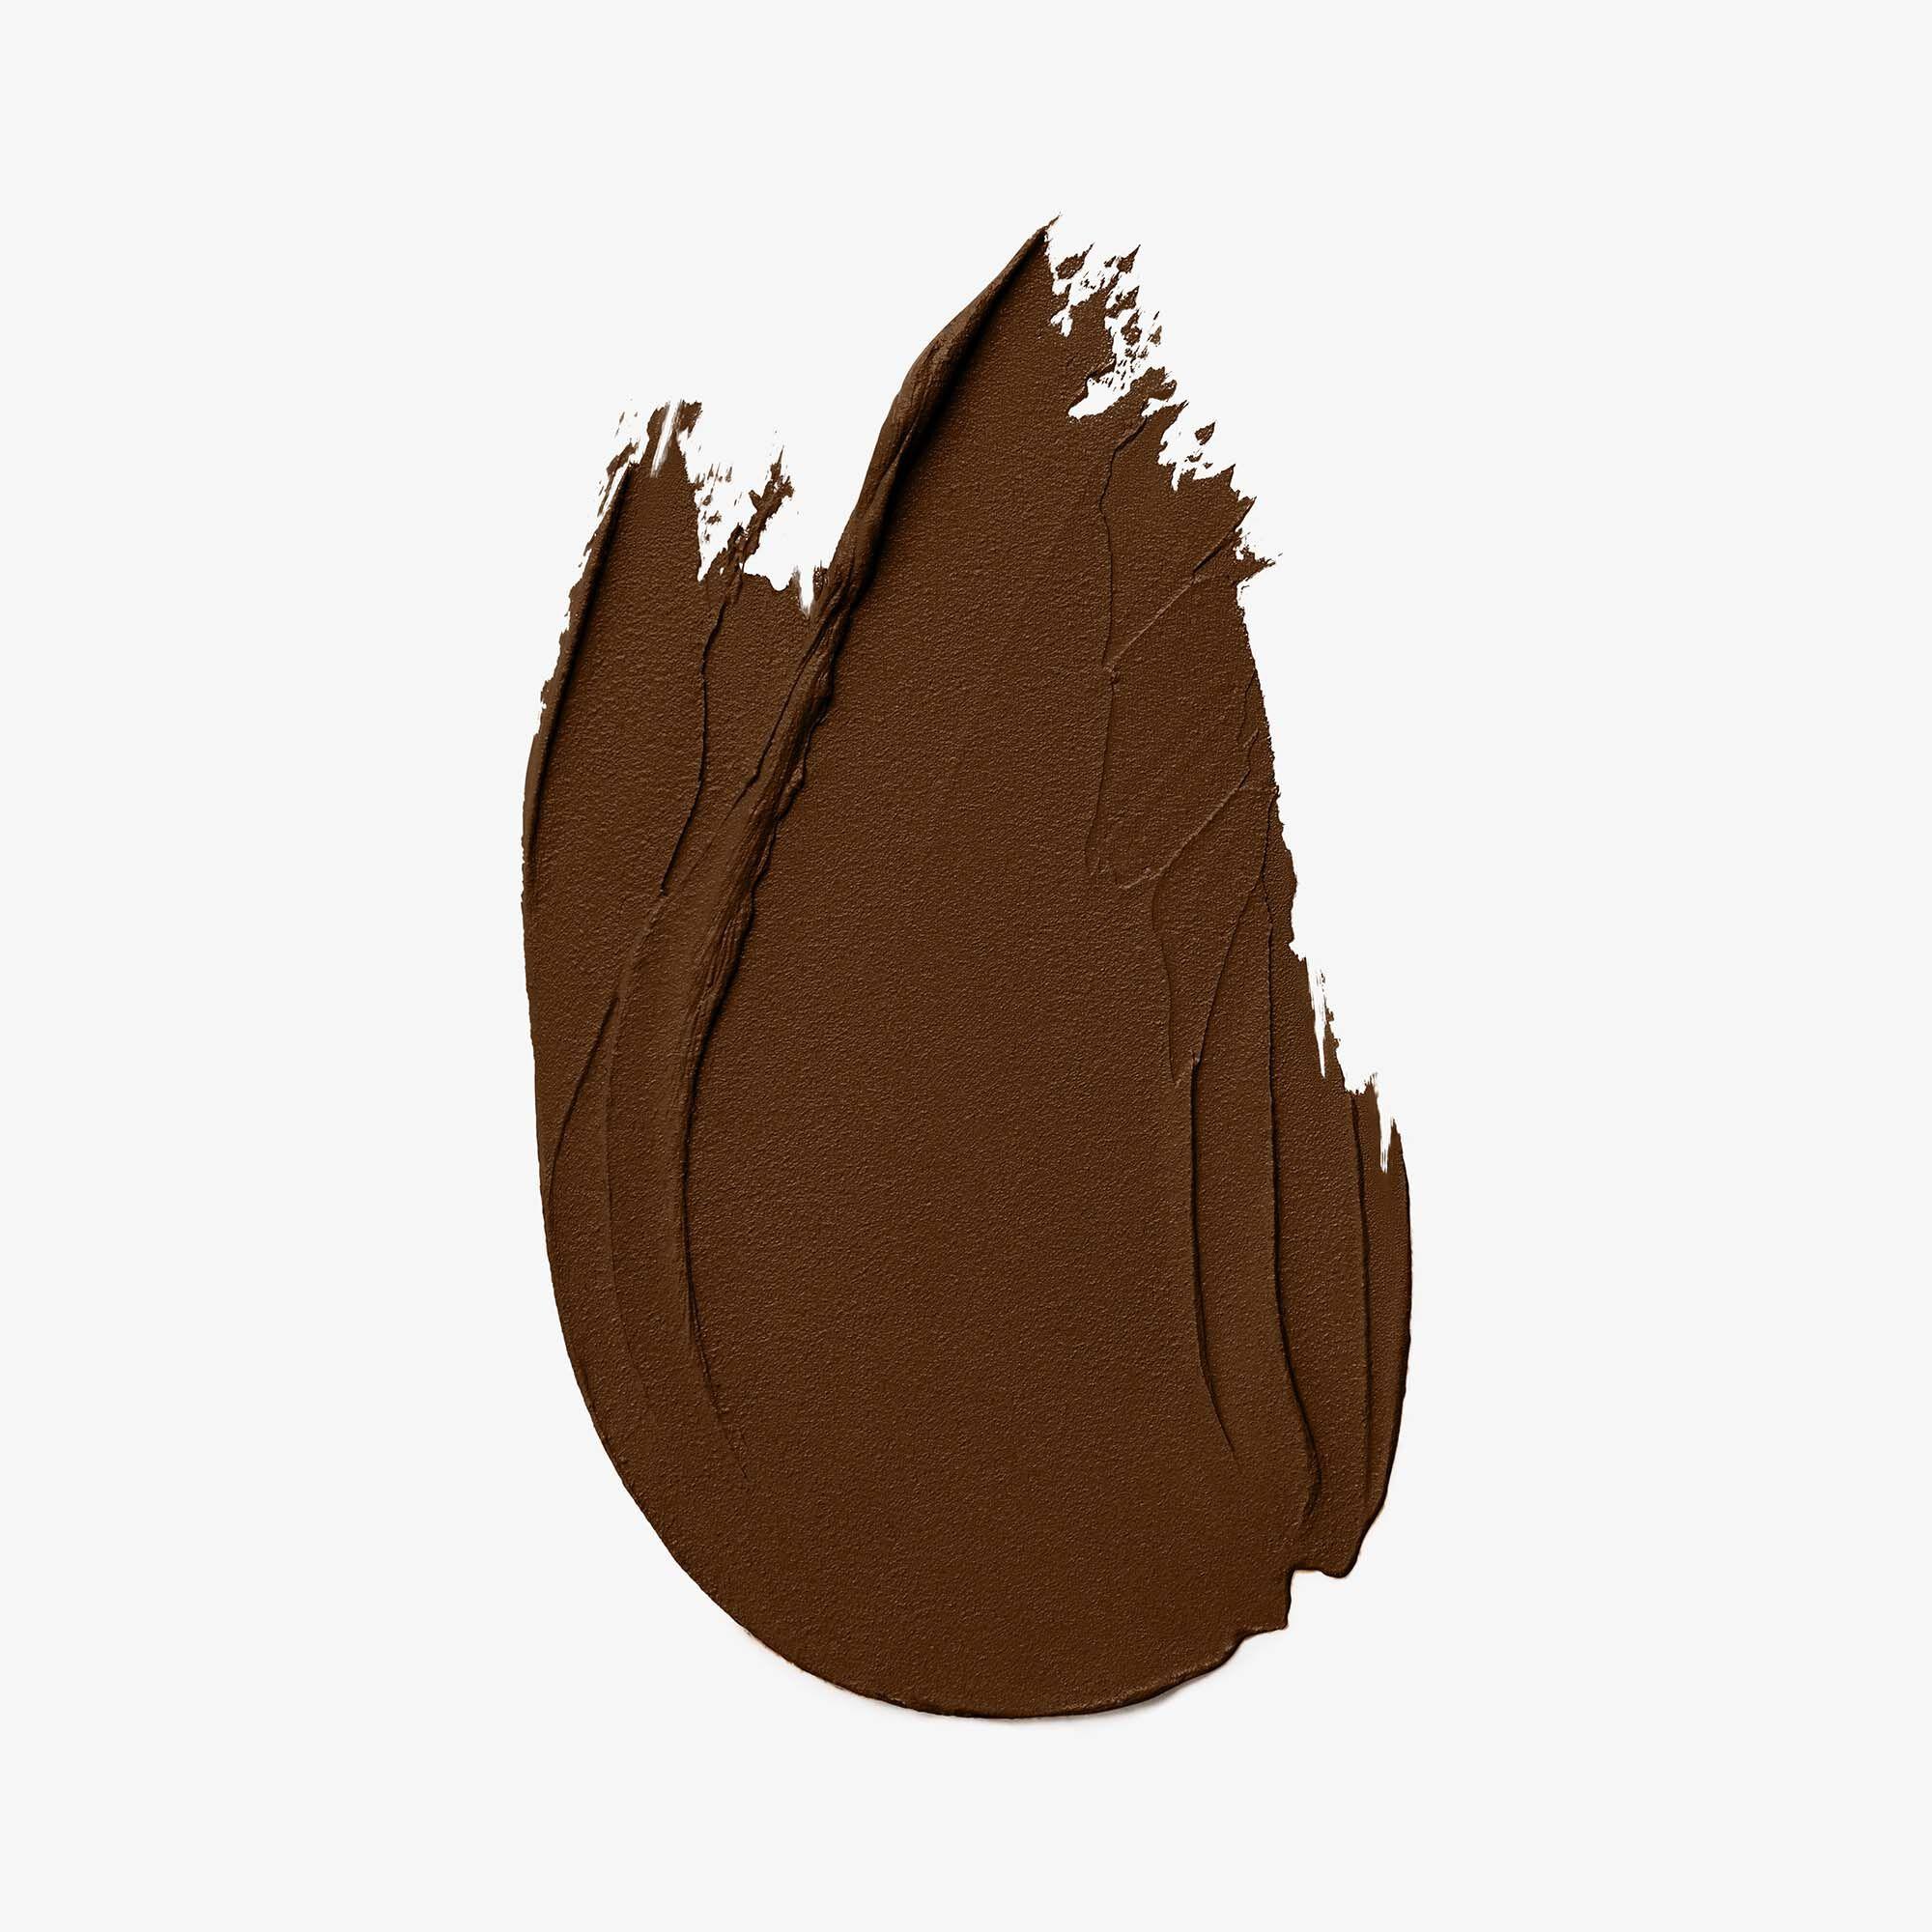 Cream Foundation, Walnut